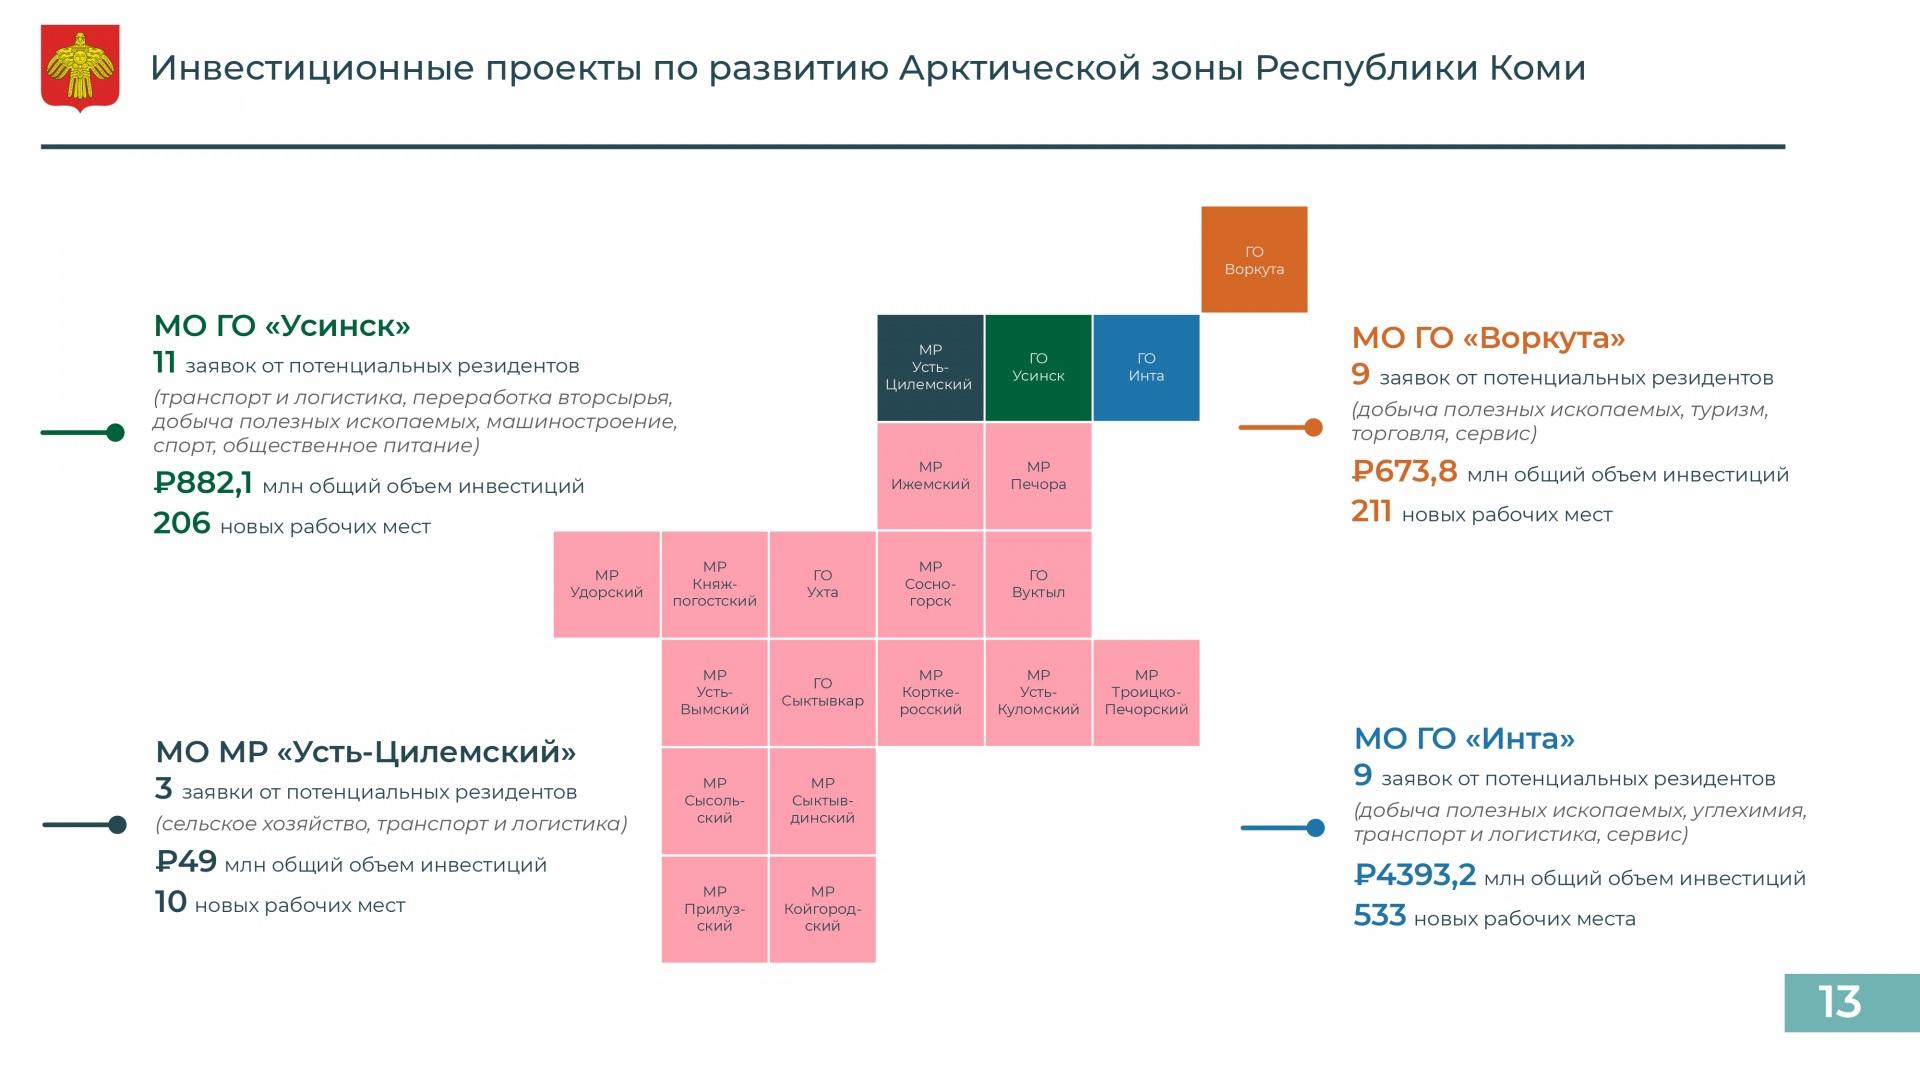 Doklad_Glavy_2021_page-0013.jpg